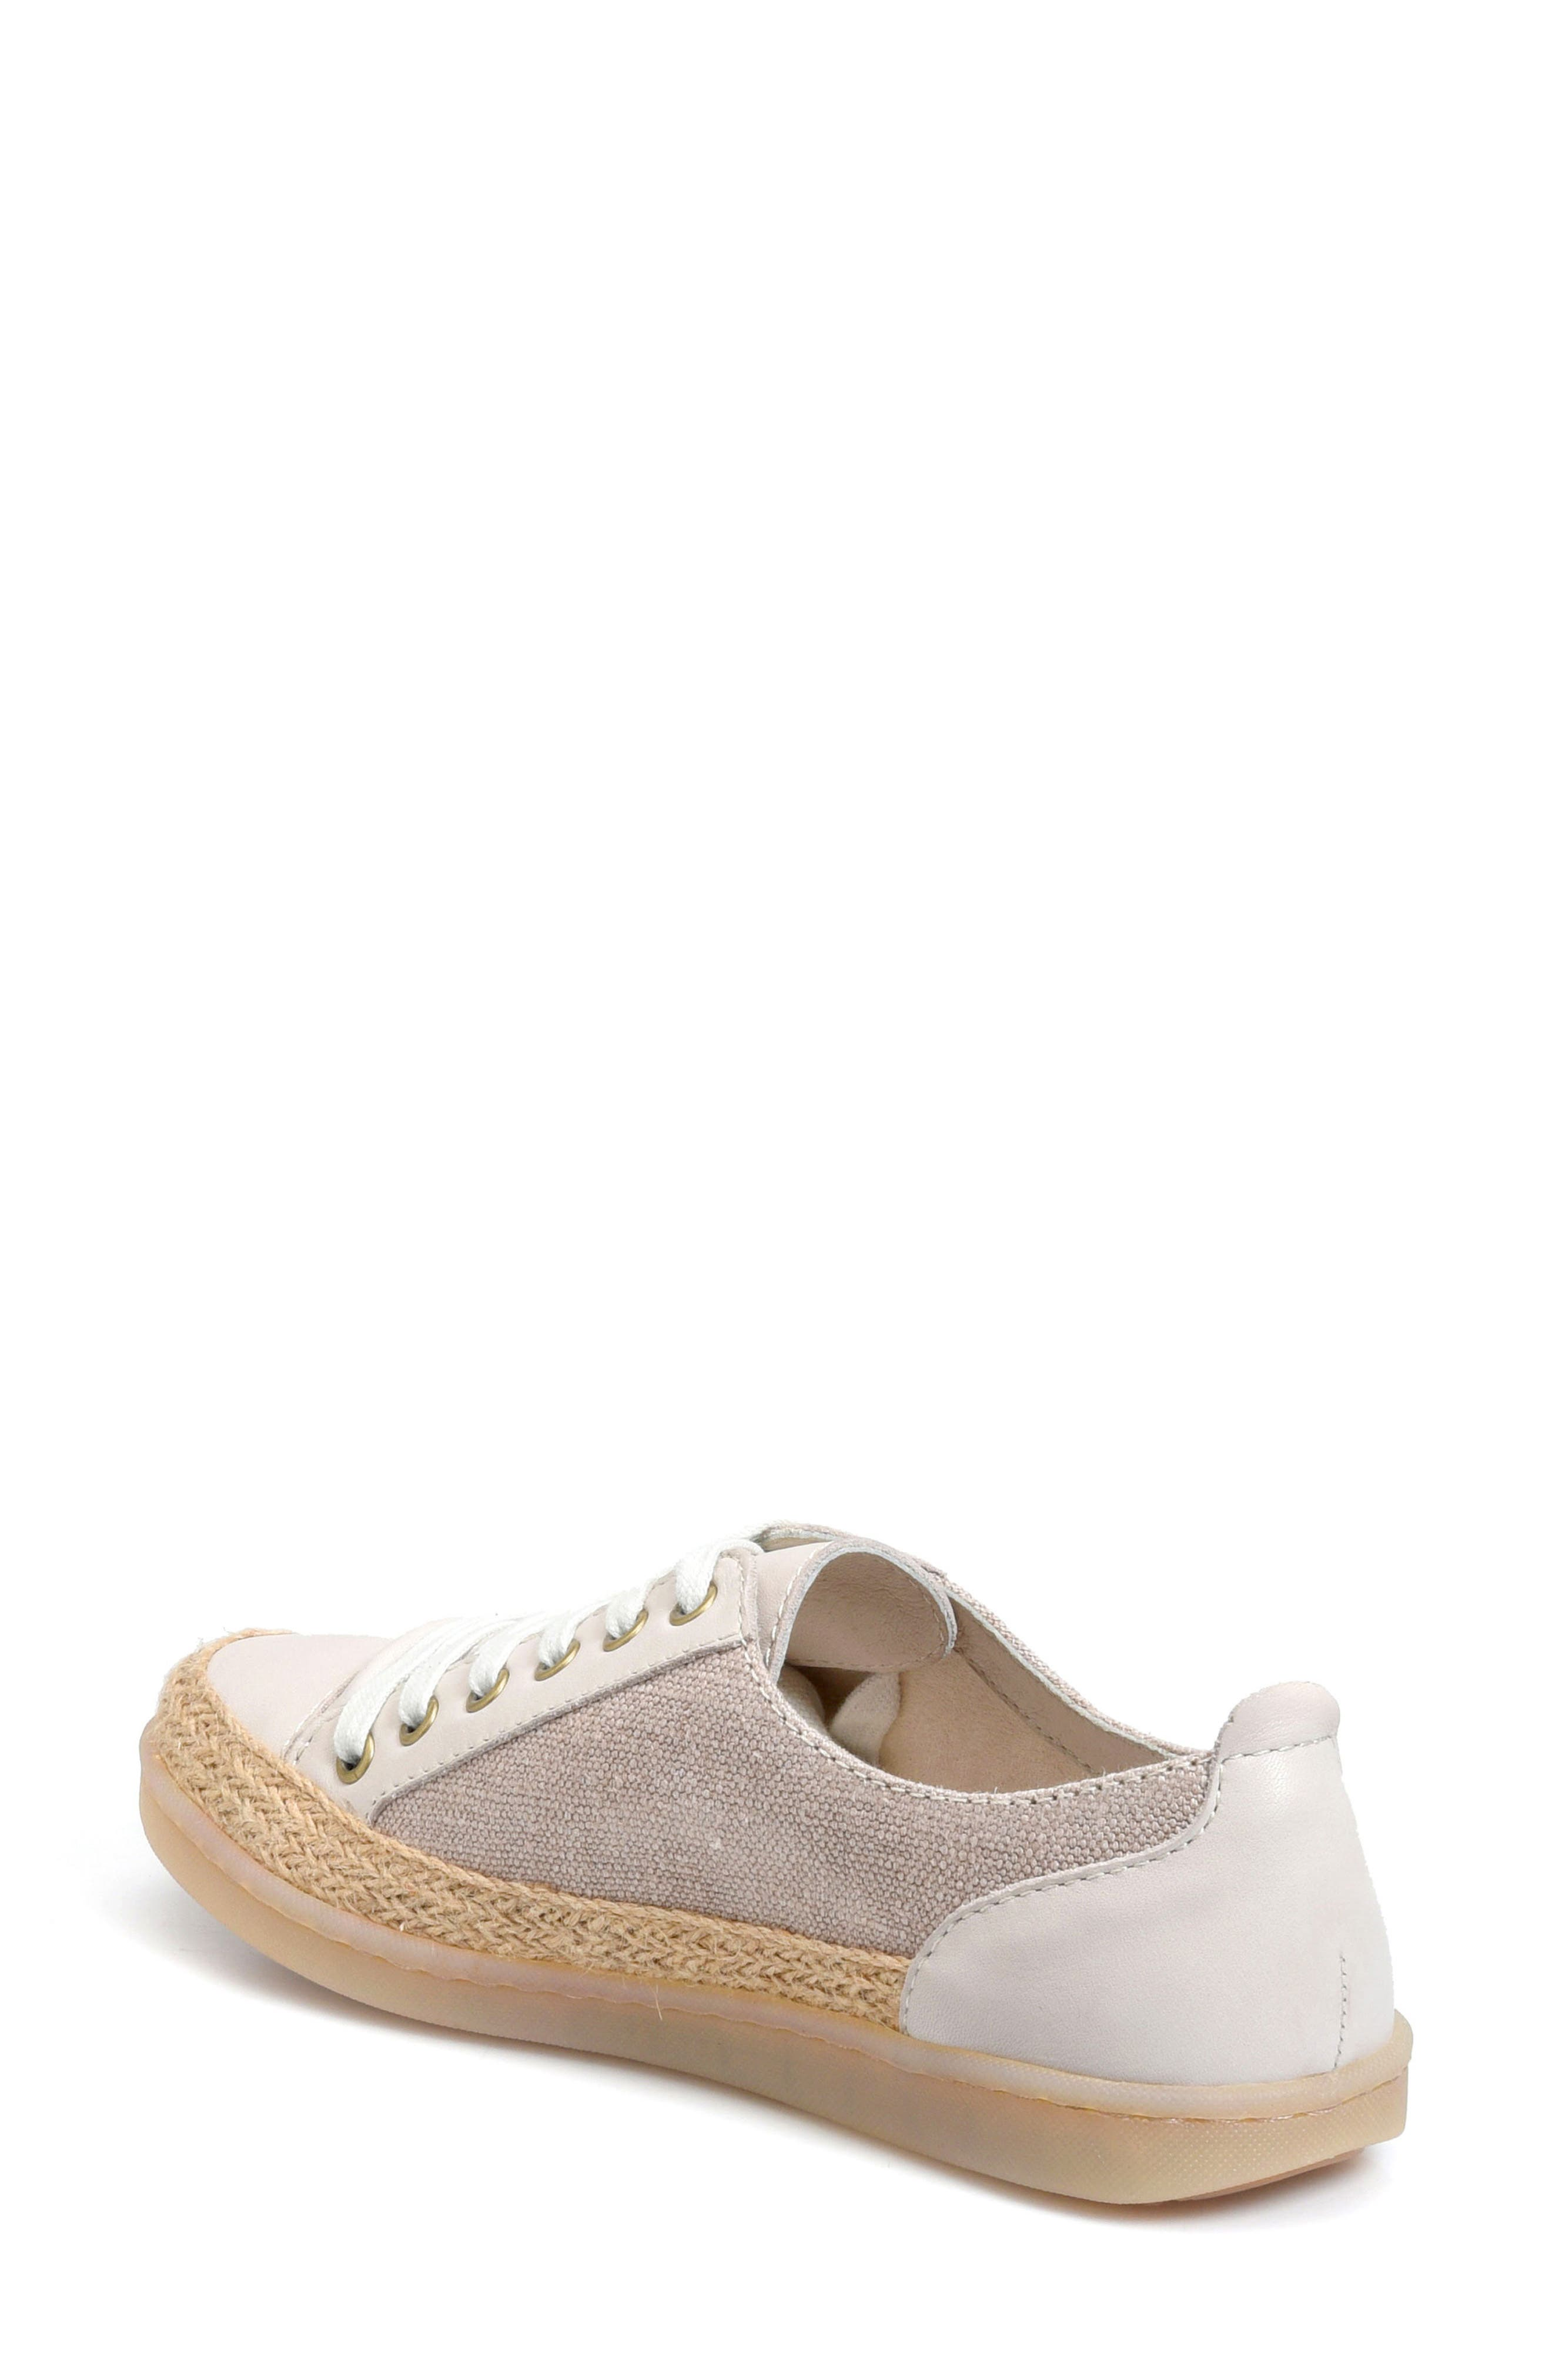 Corfield Sneaker,                             Alternate thumbnail 2, color,                             261